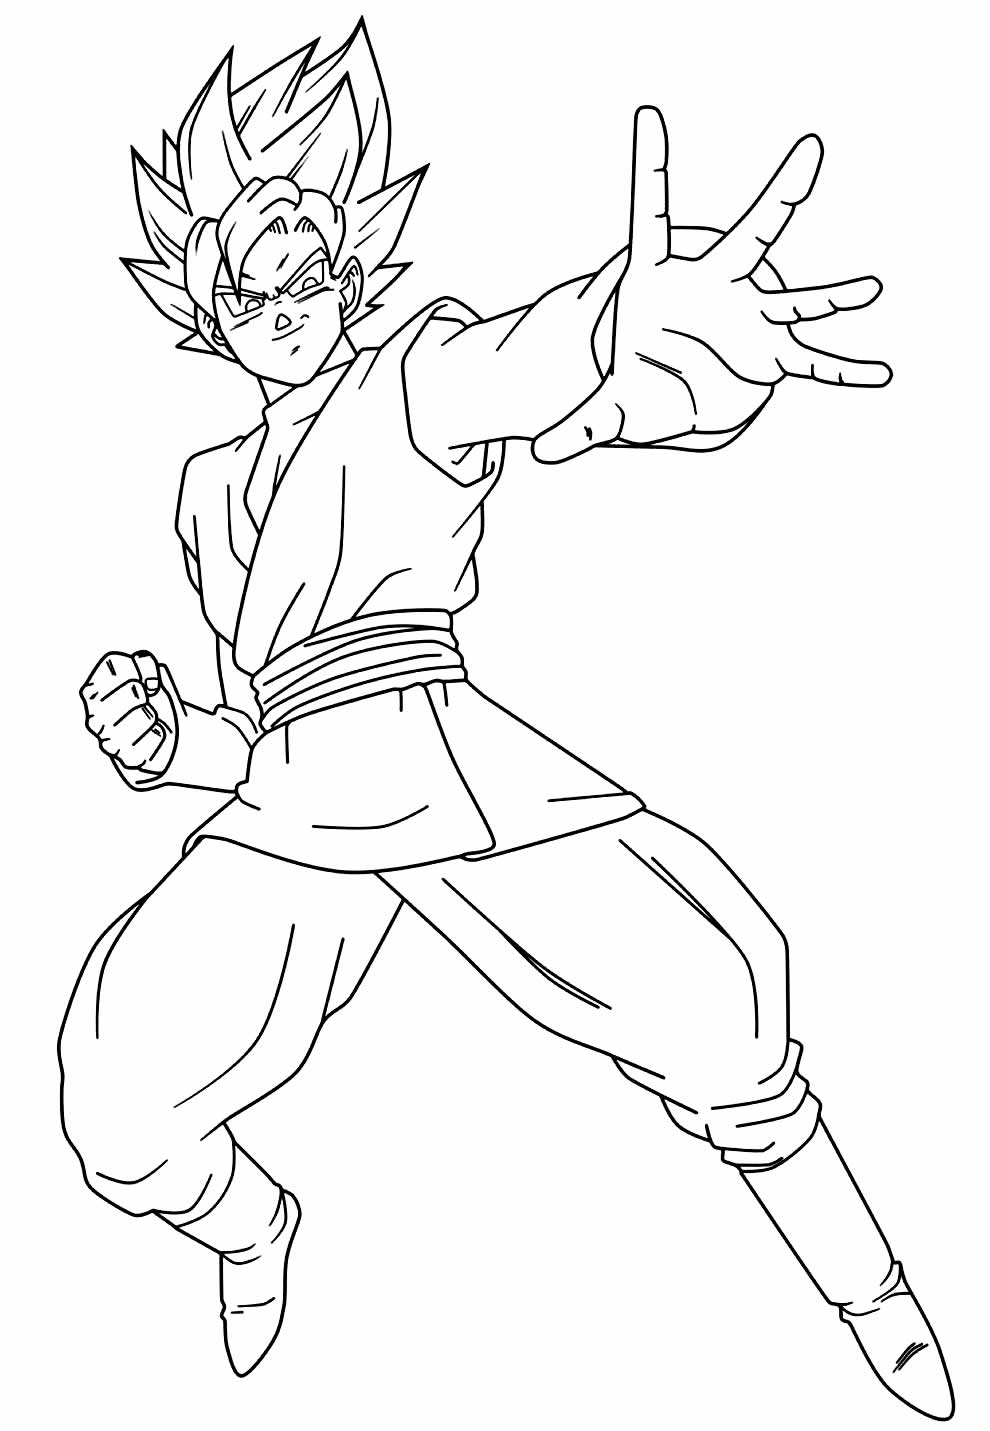 Goku image to paint